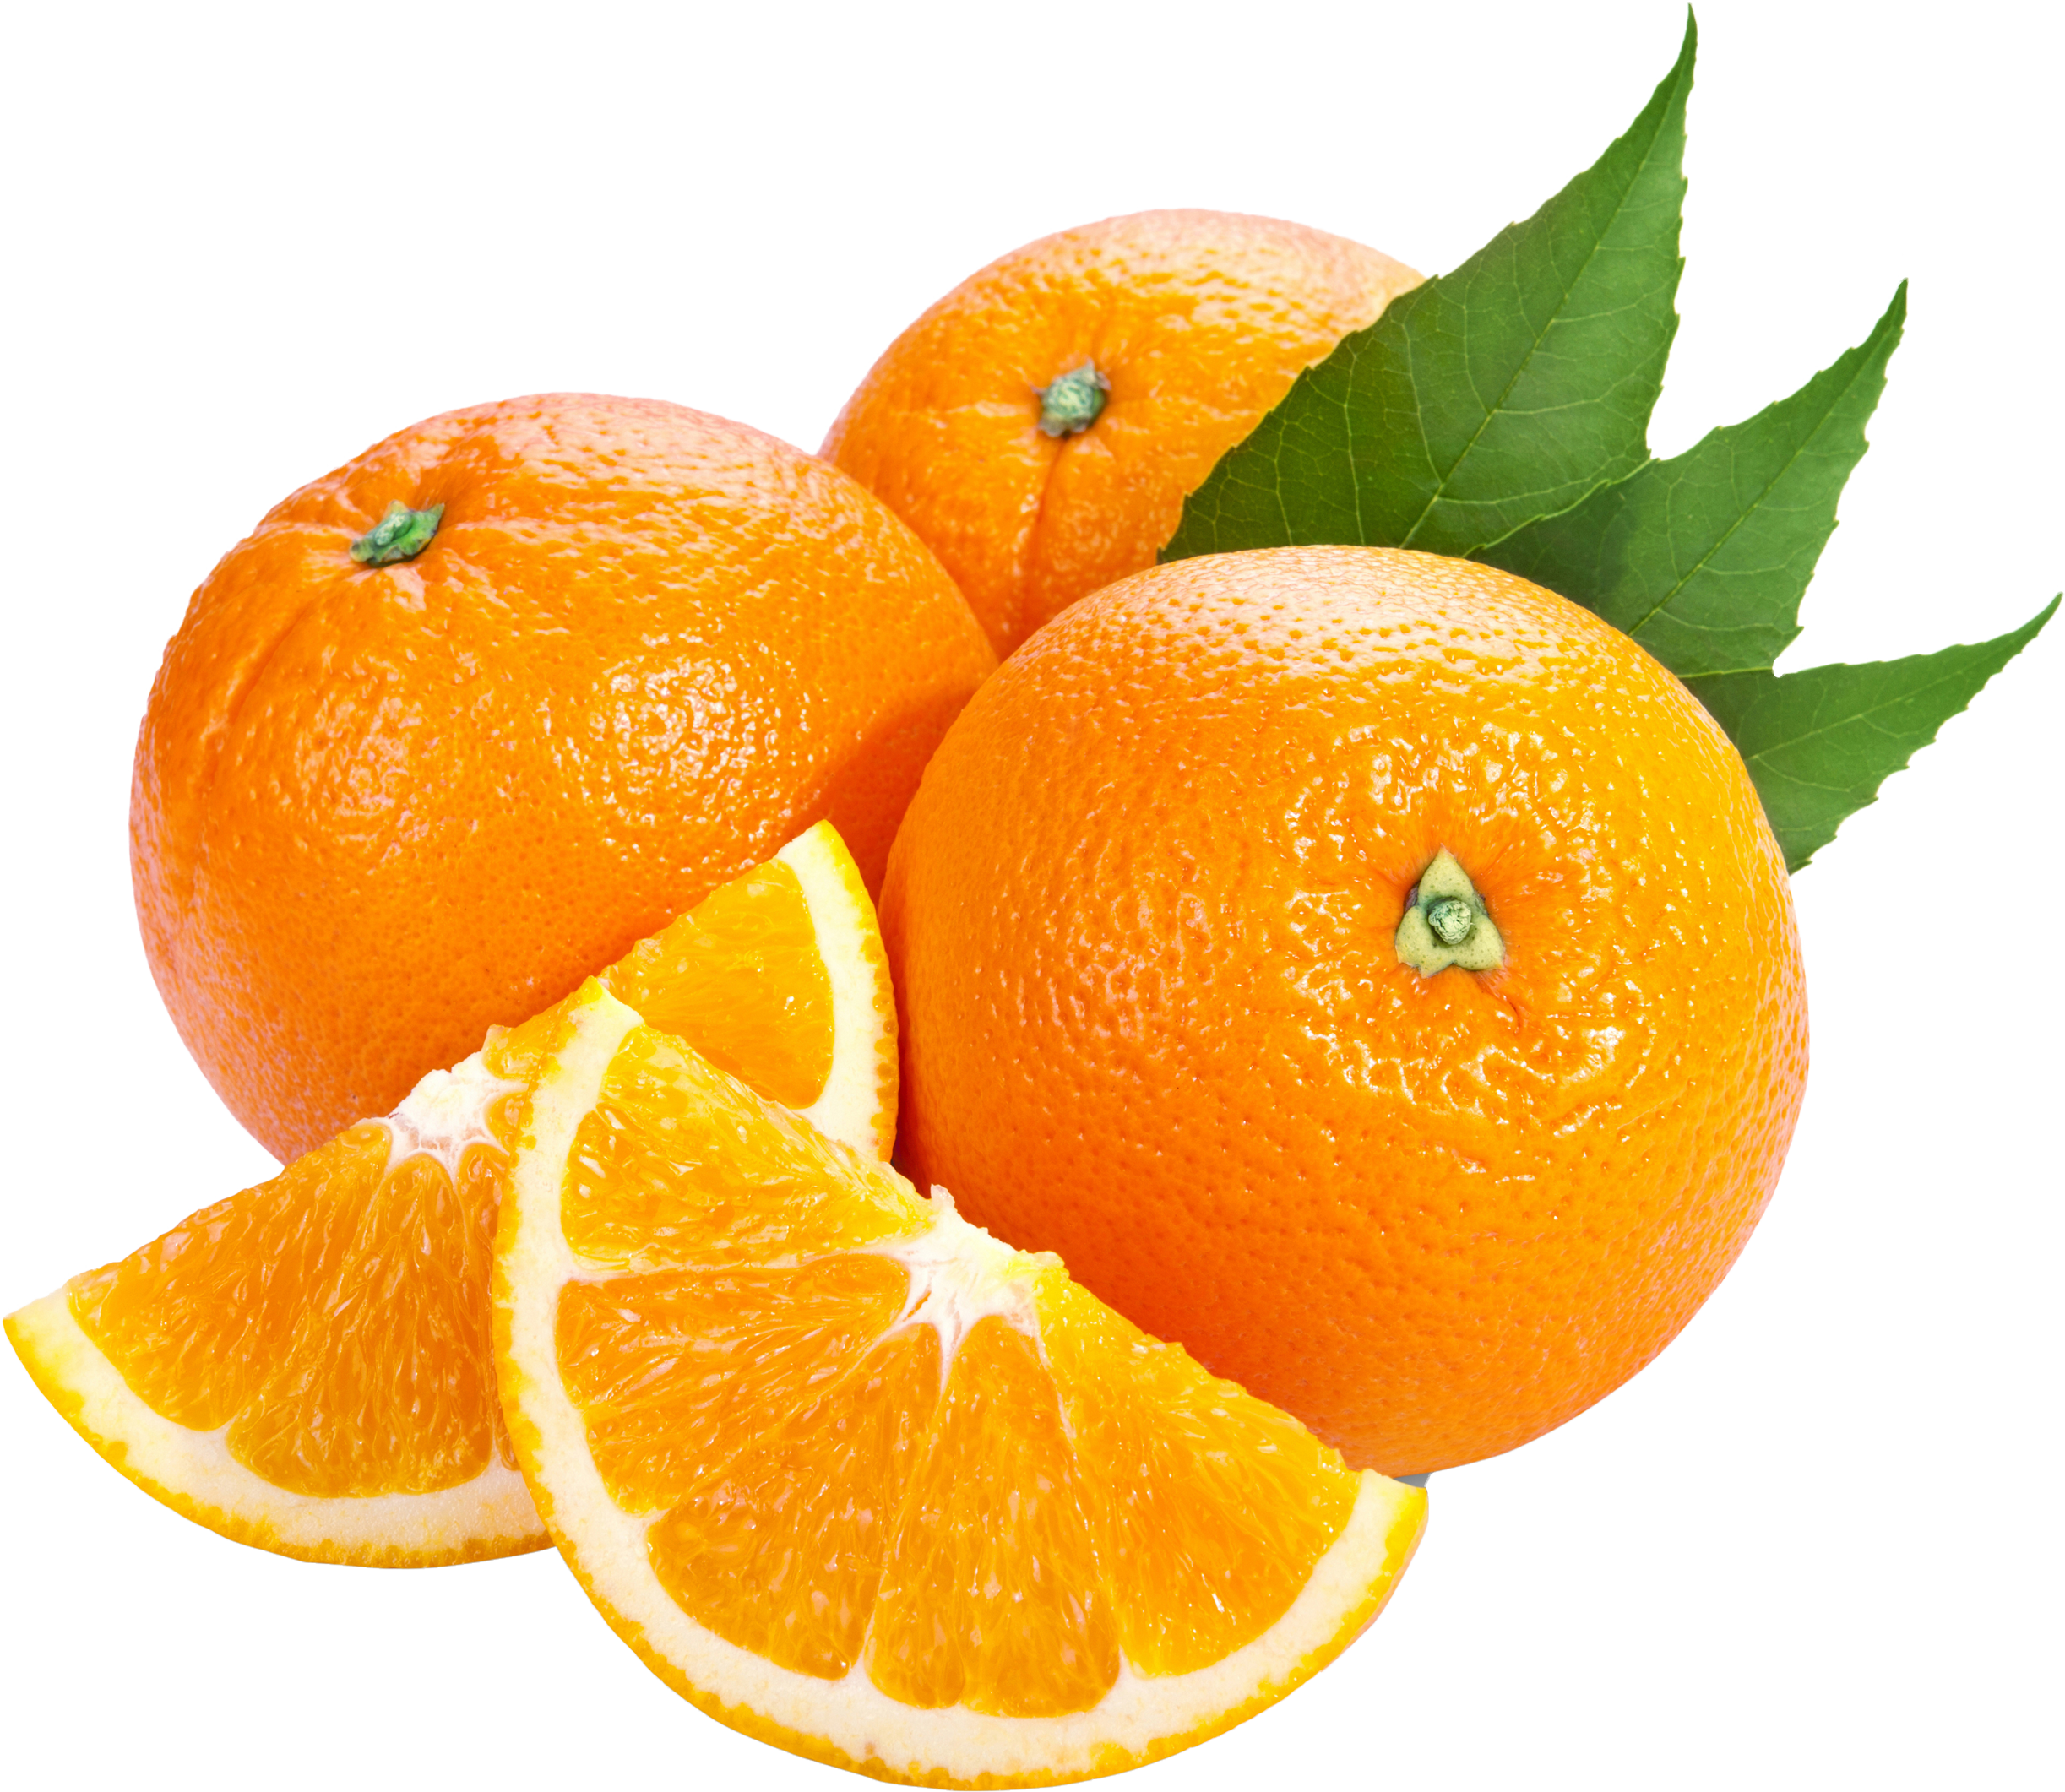 Png Oranges Frutta Immagini Alimenti